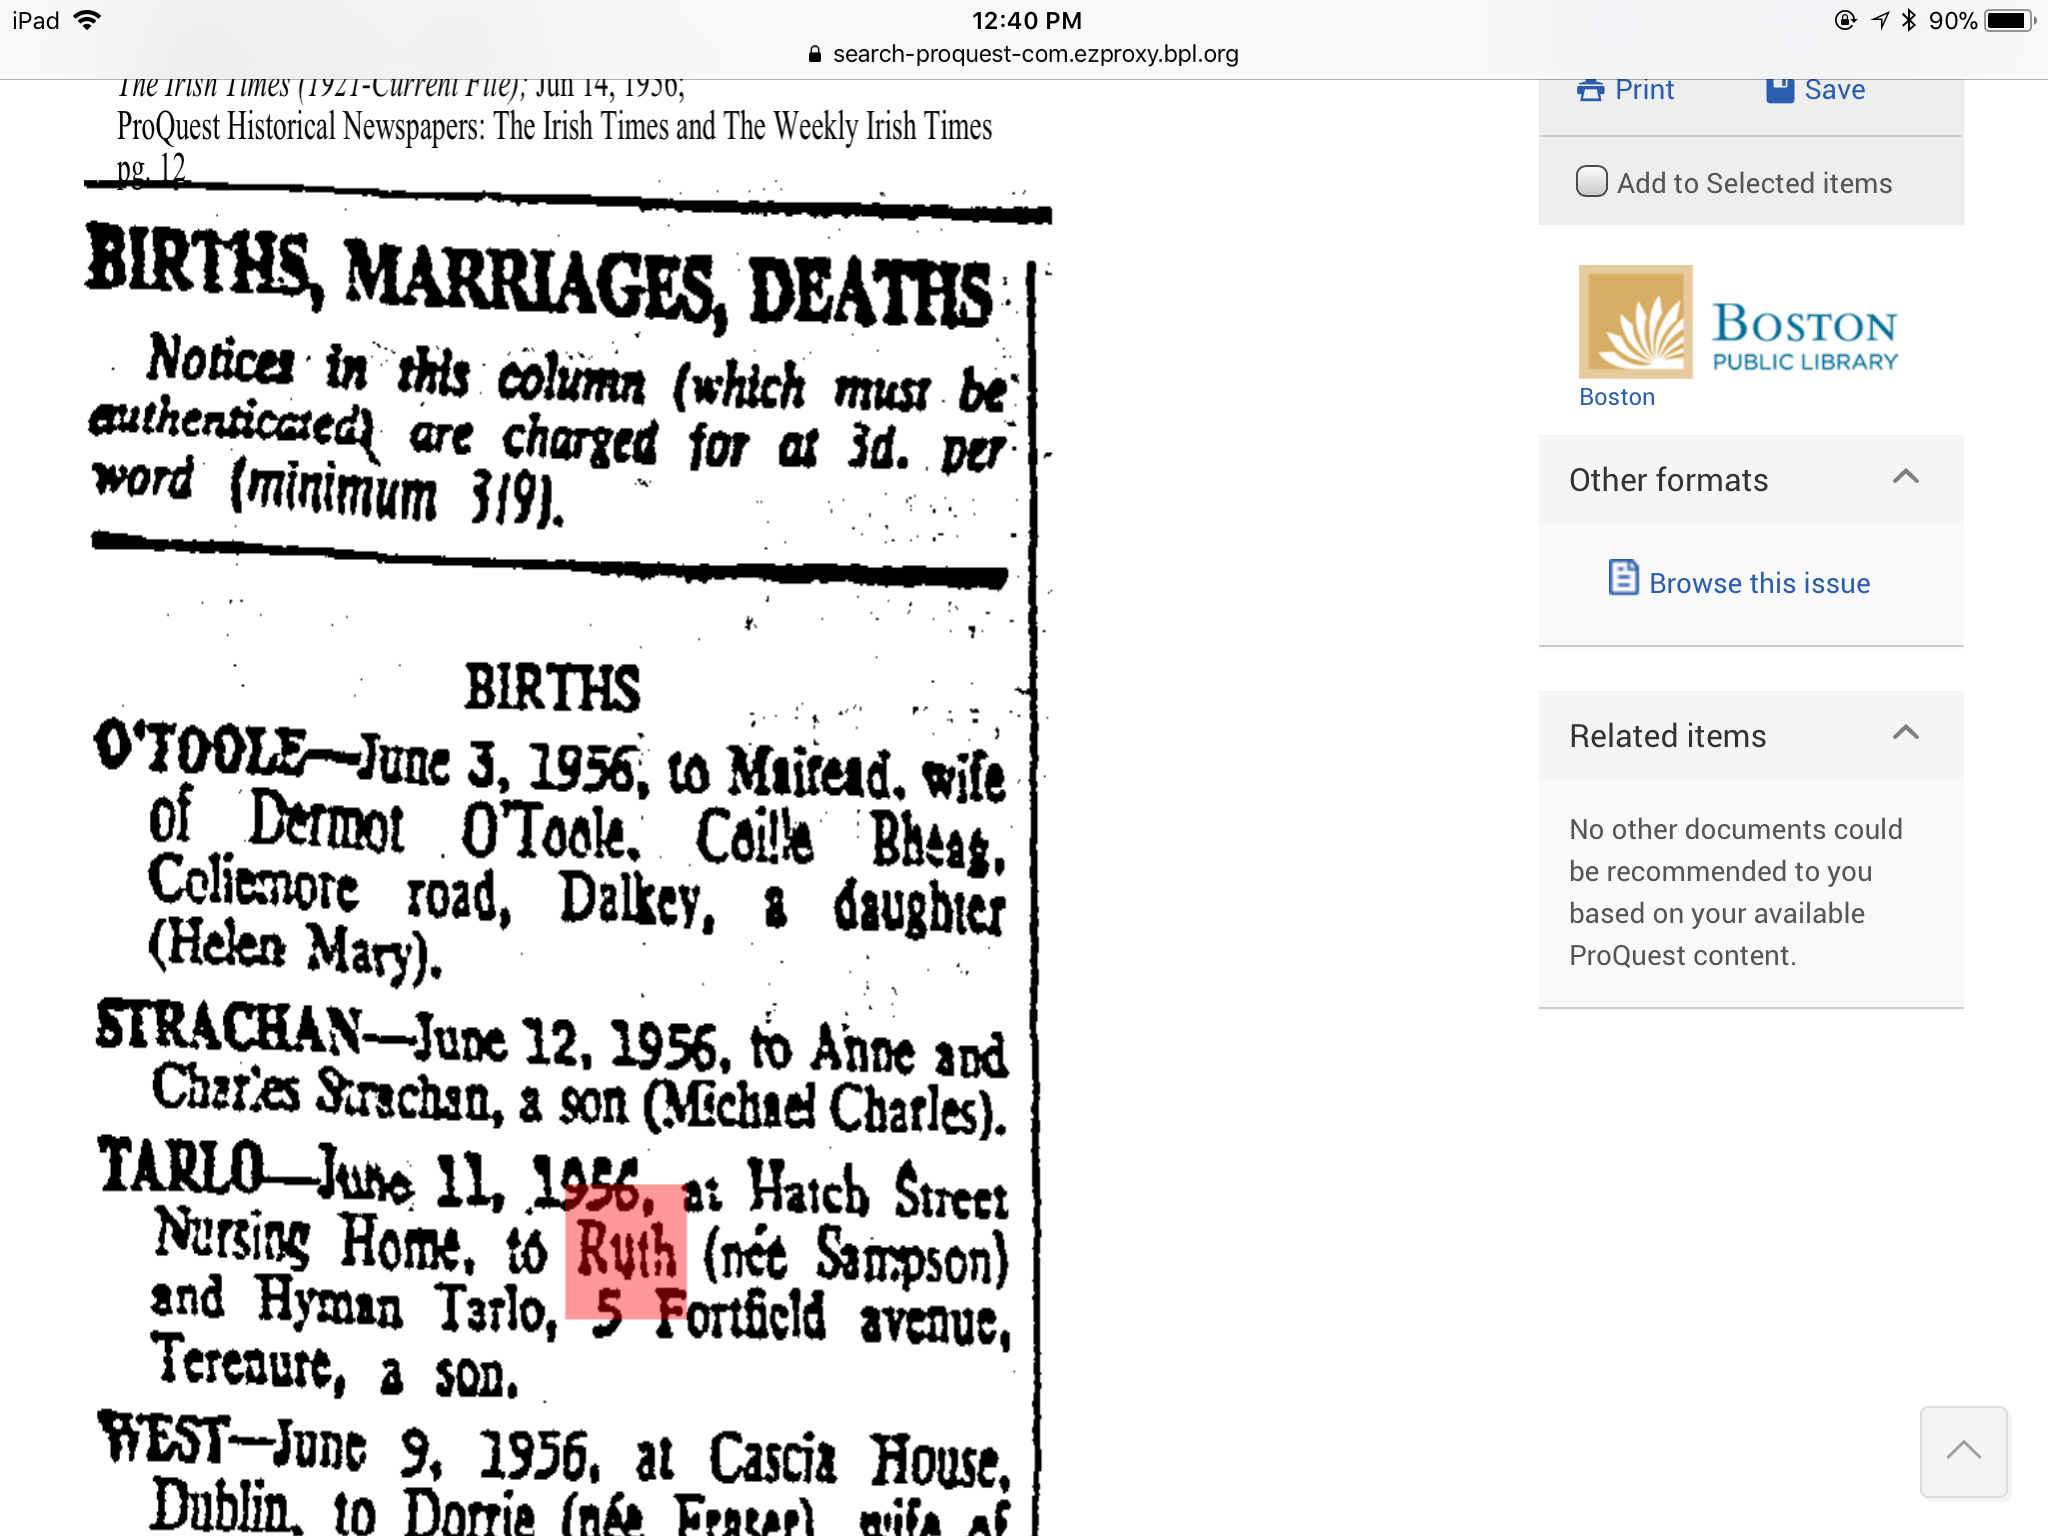 Birth Of Son To Ruth Tarlo The Irish Times Dublin Ireland Page 12 Jun 14 1956 Historical Newspaper Irish Times